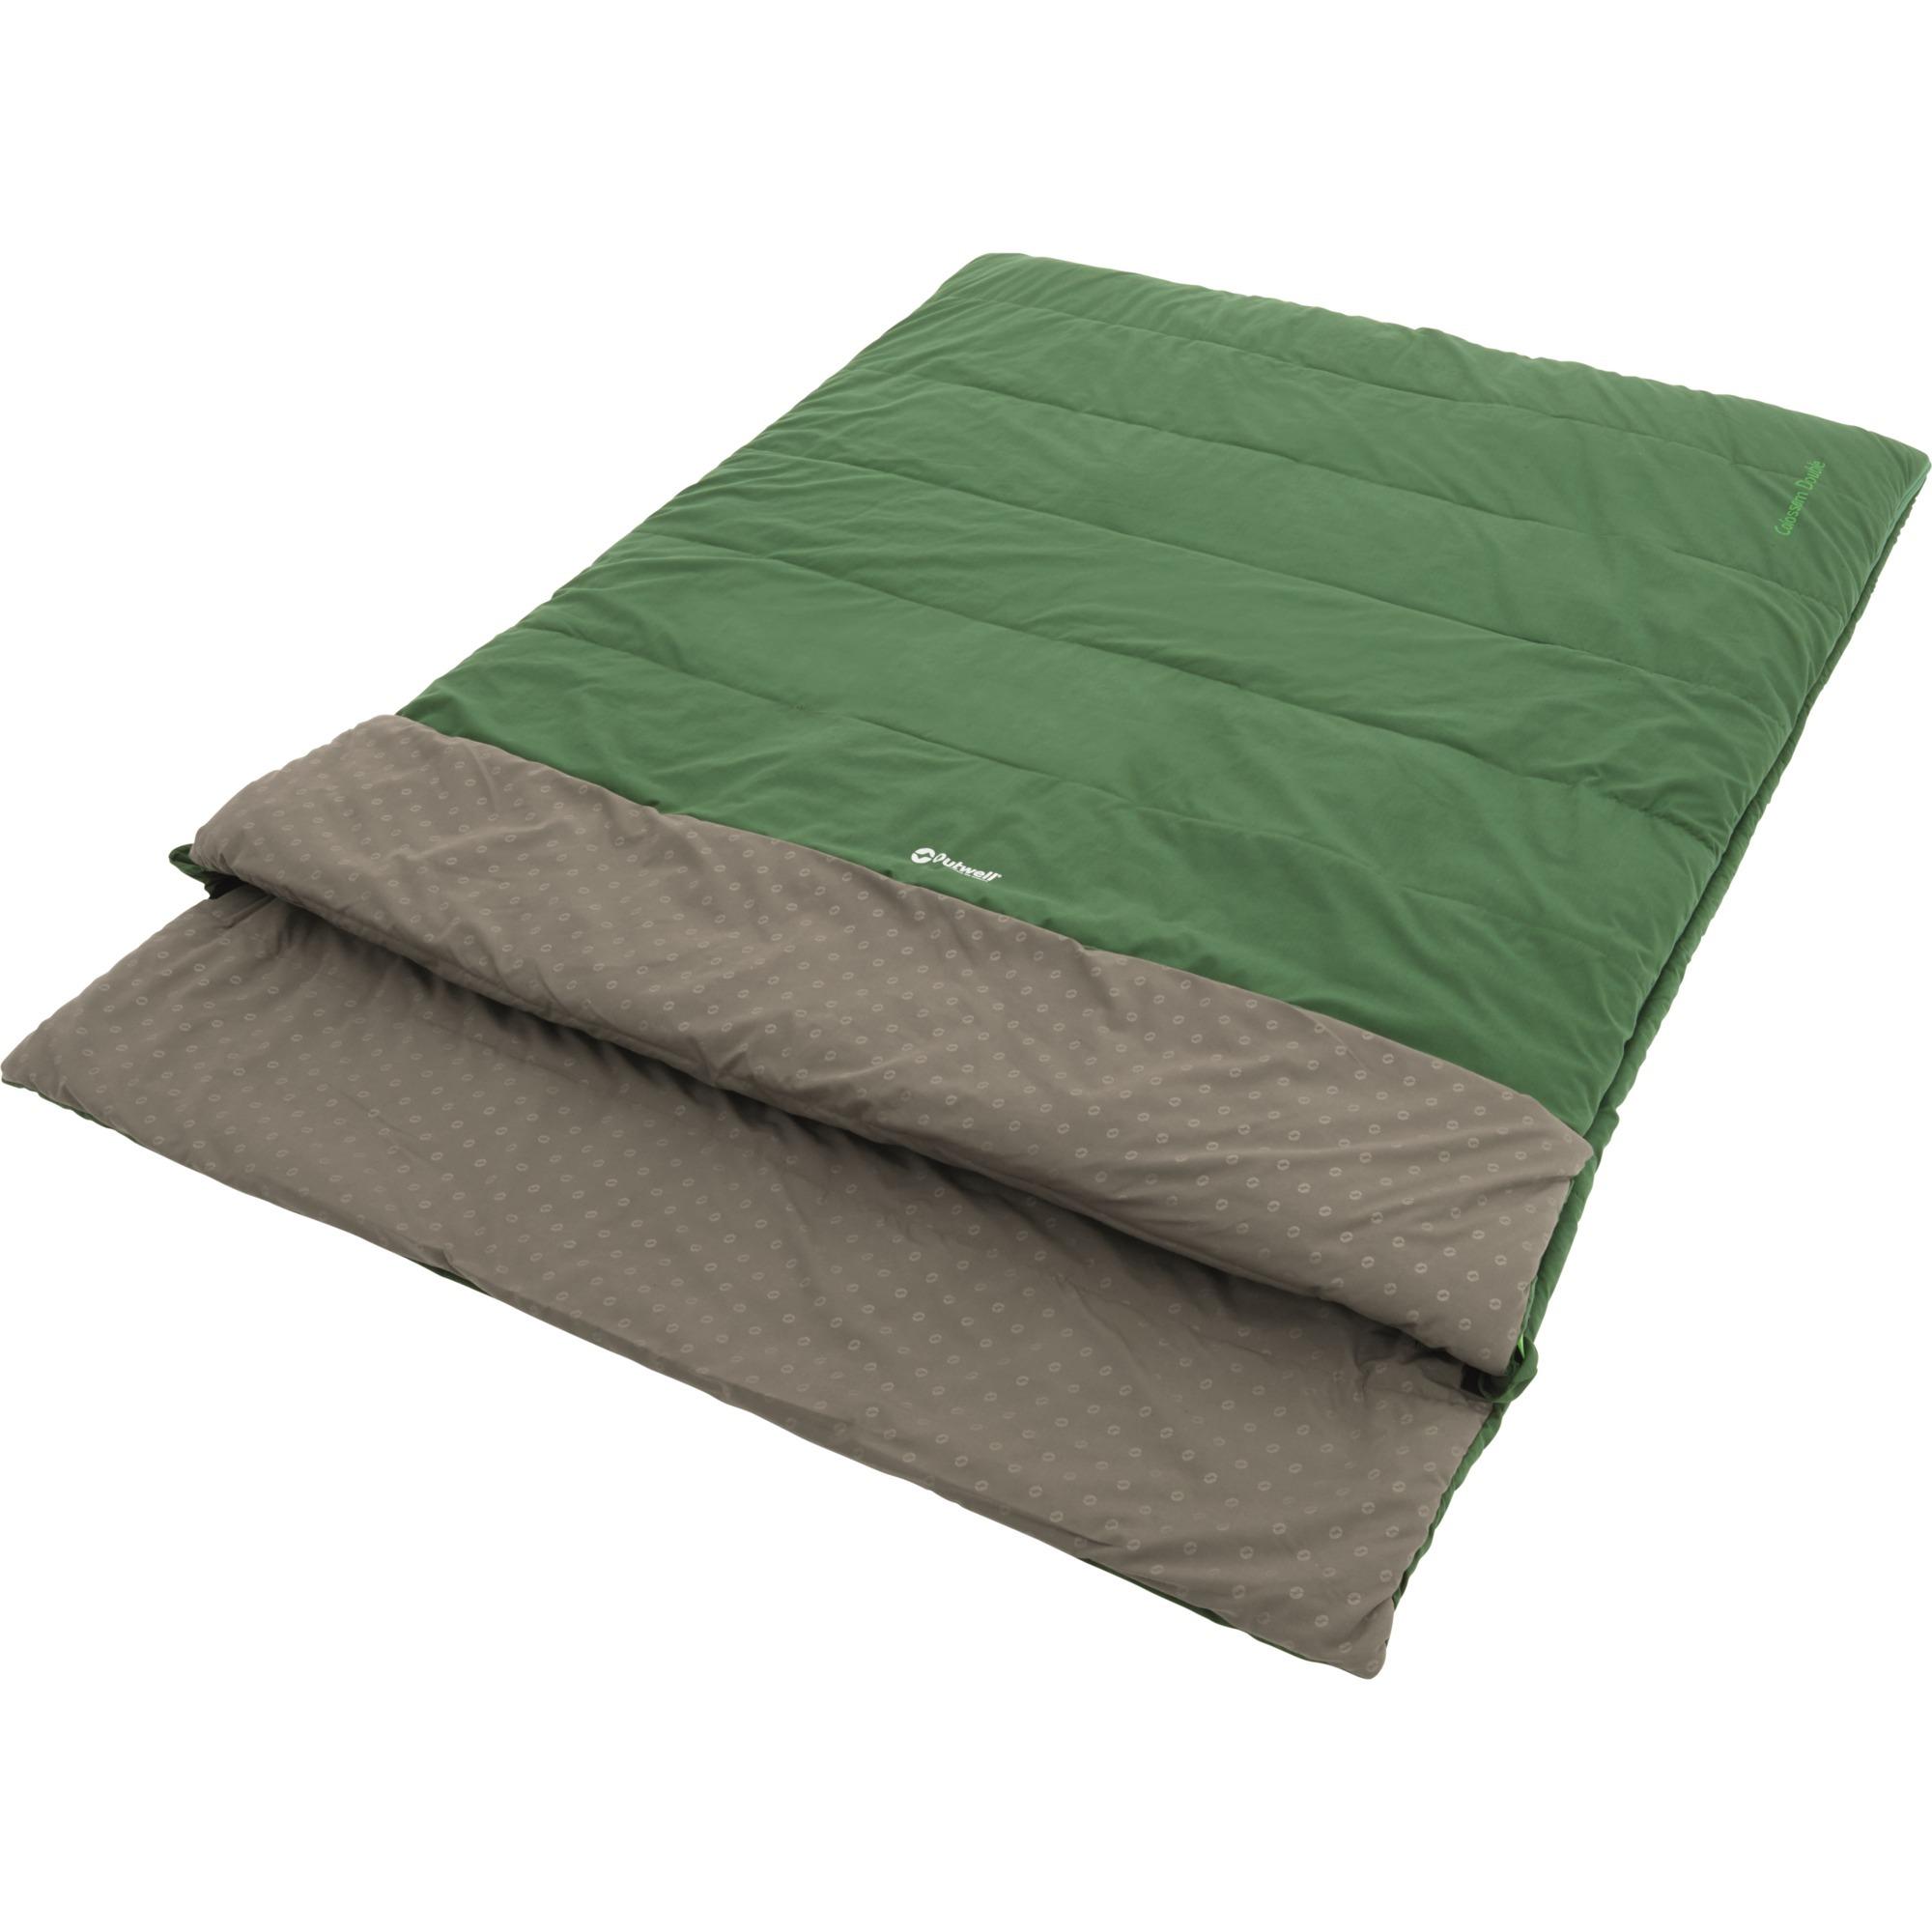 colosseum-double-rectangular-sleeping-bag-bomuld-polyester-gron